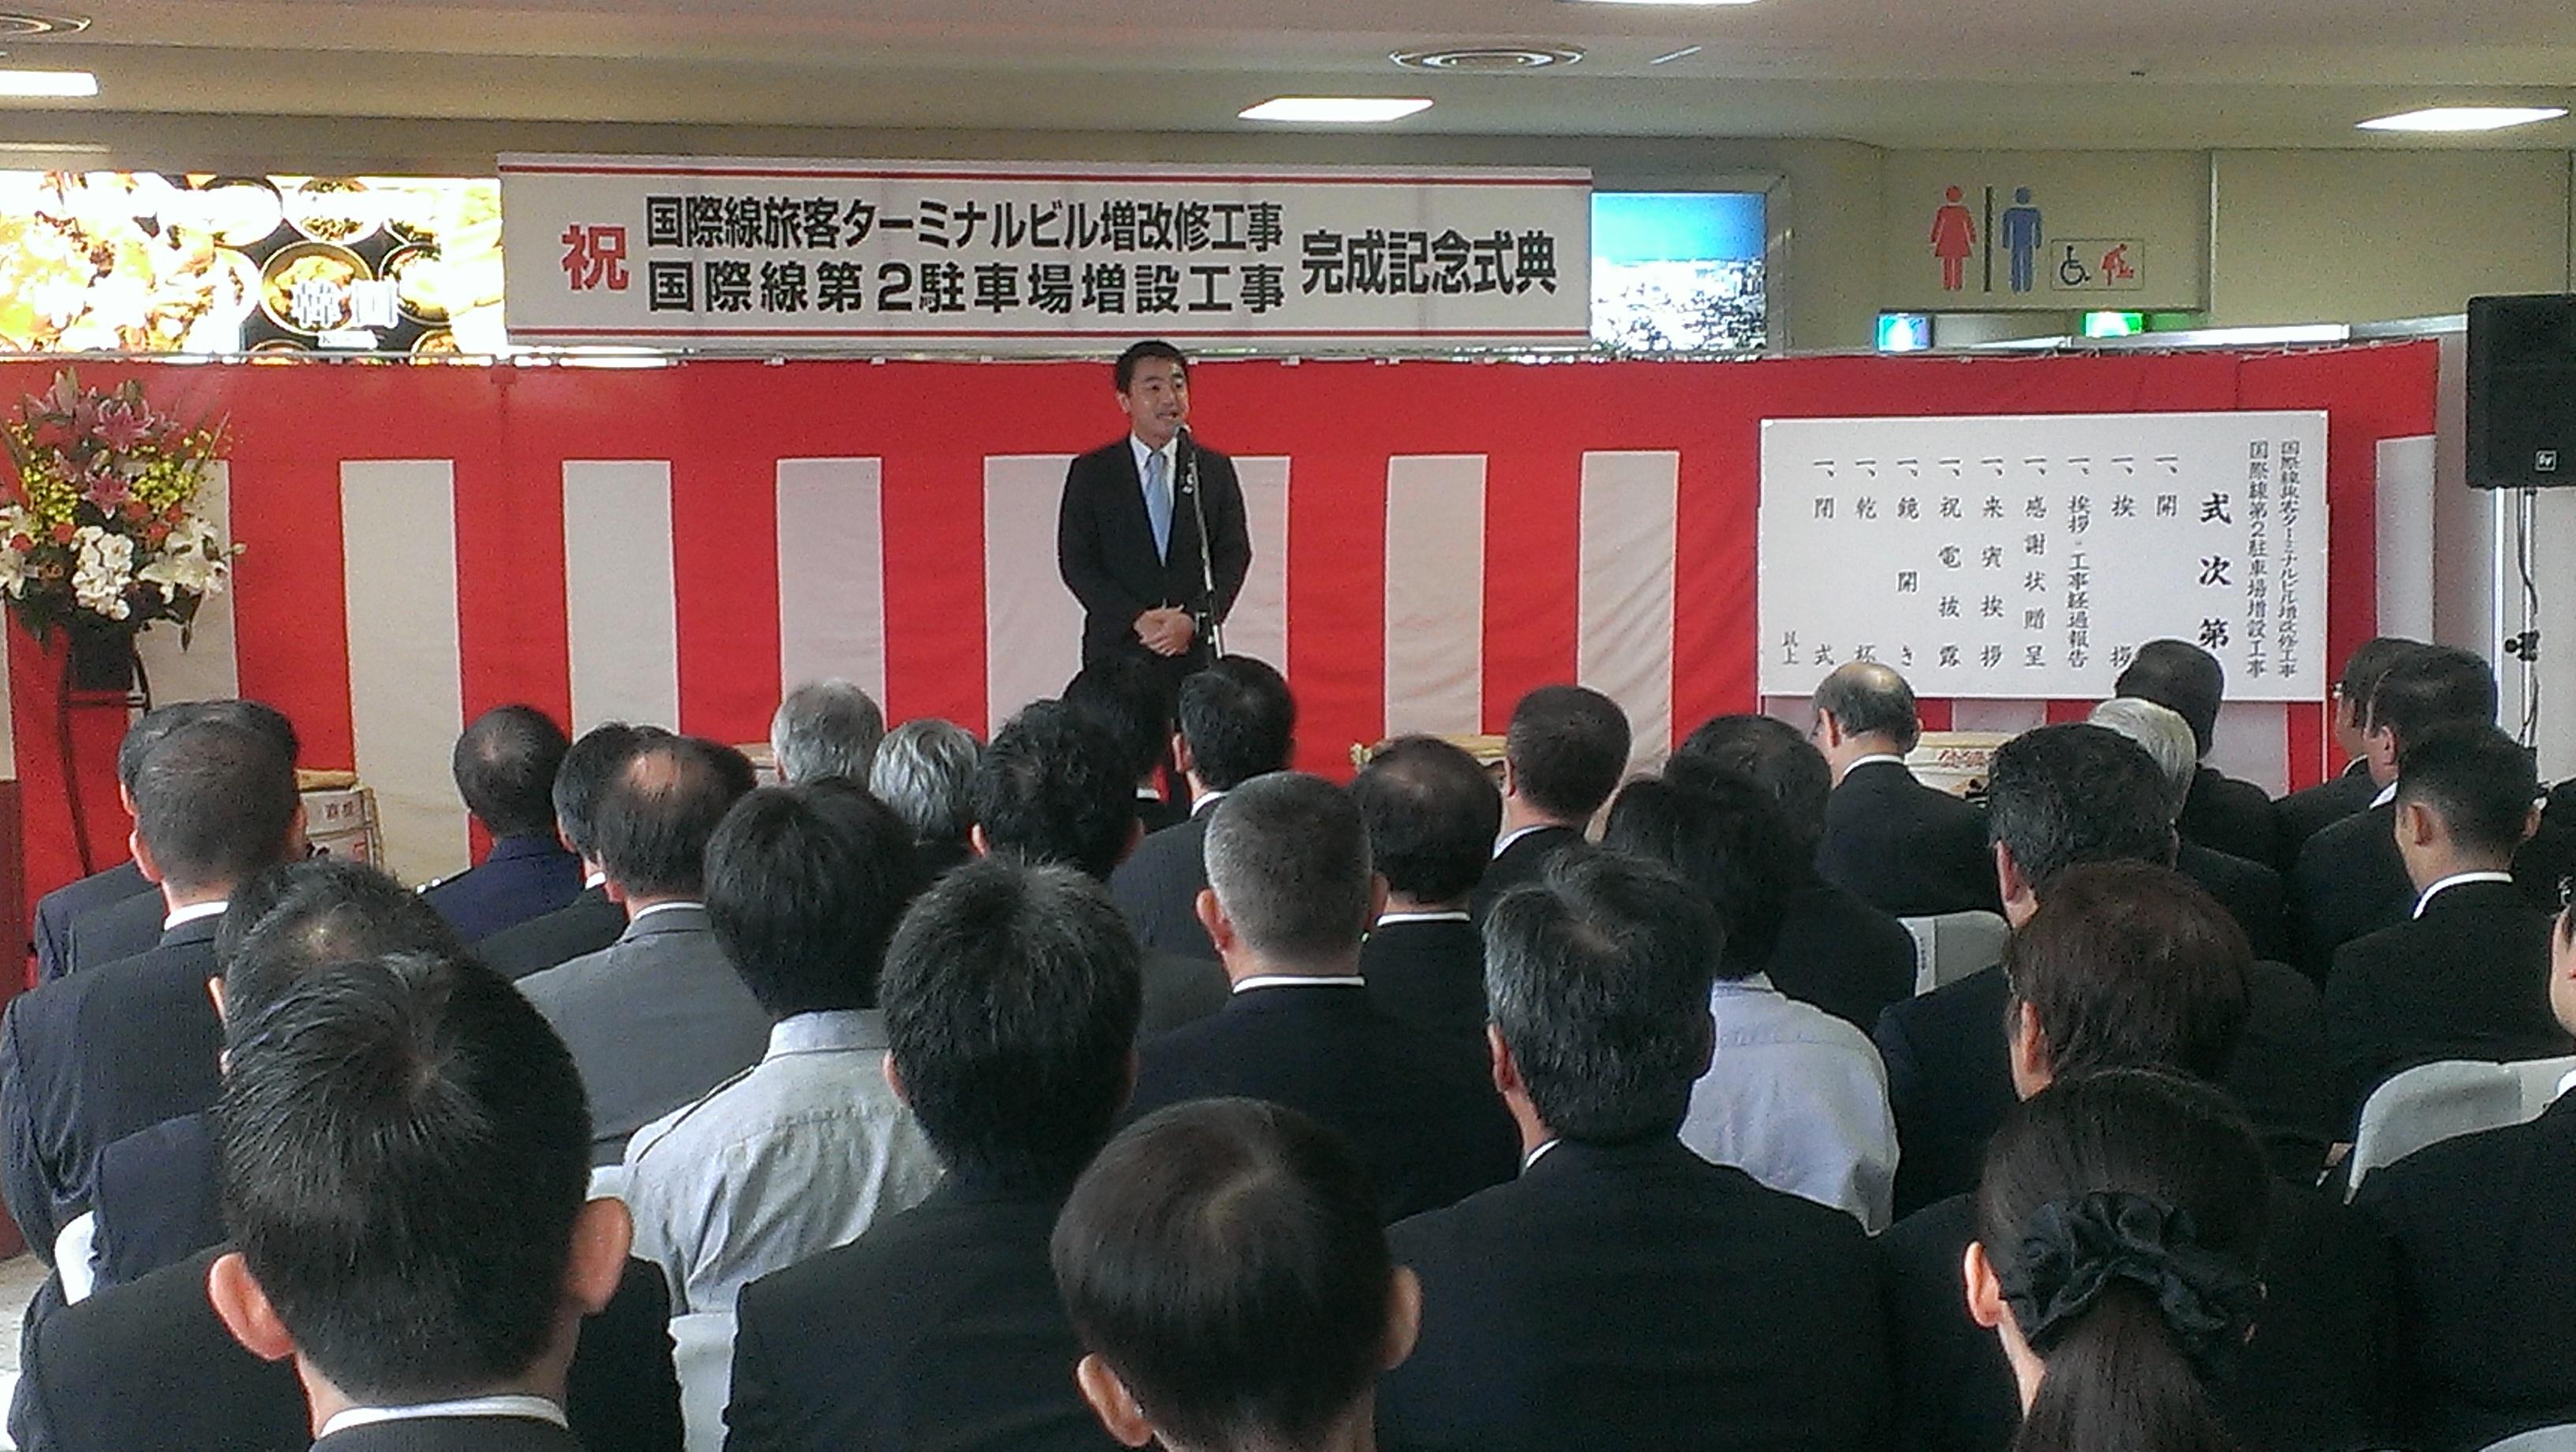 H25.9.8小松空港国際線旅客ターミナルビル増改修工事等完成記念式典